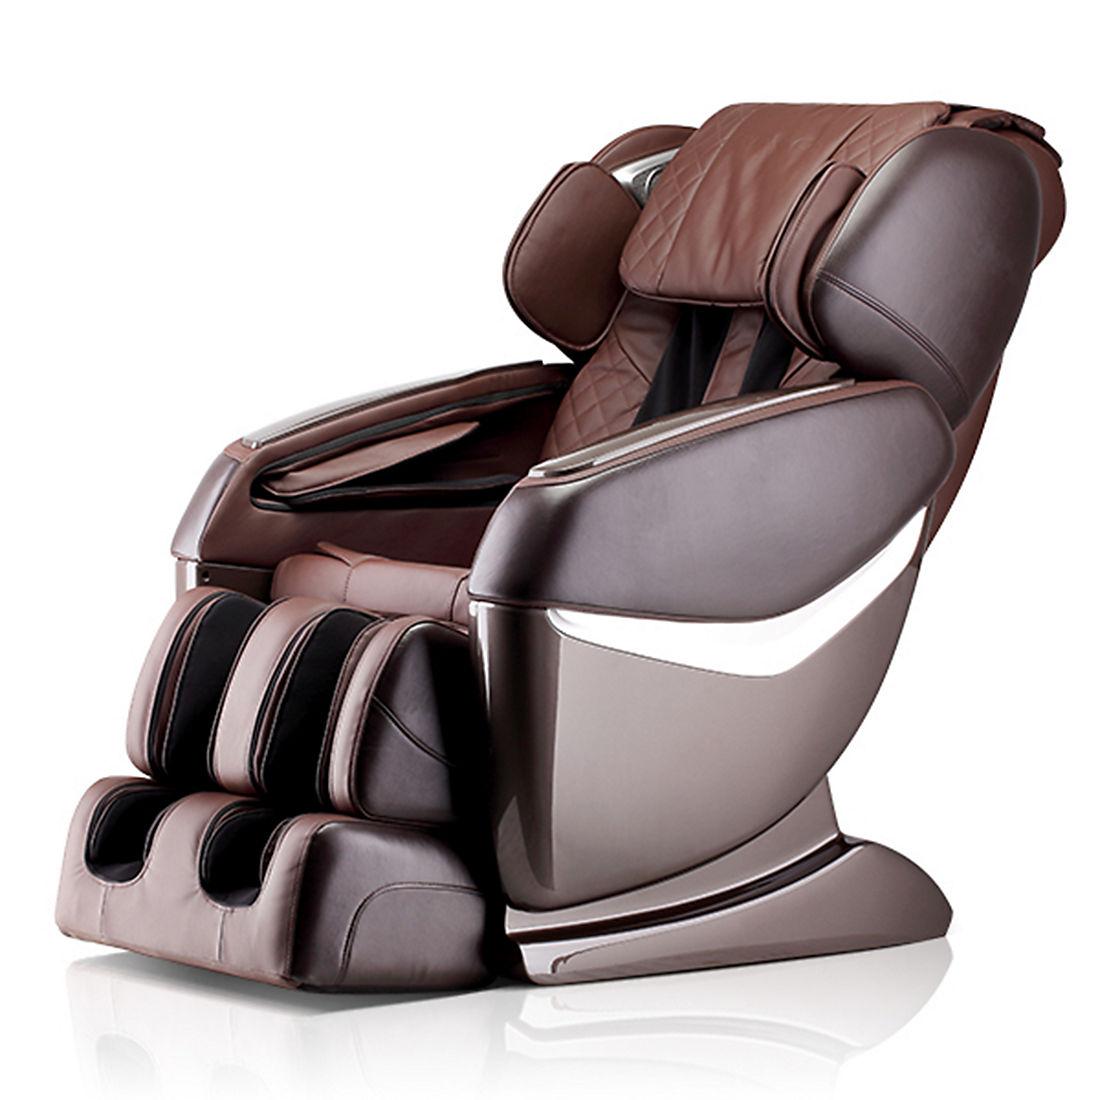 Lifesmart Ultimate Zero Gravity Faux Leather Massage Chair Brown InteriorBlack Exterior